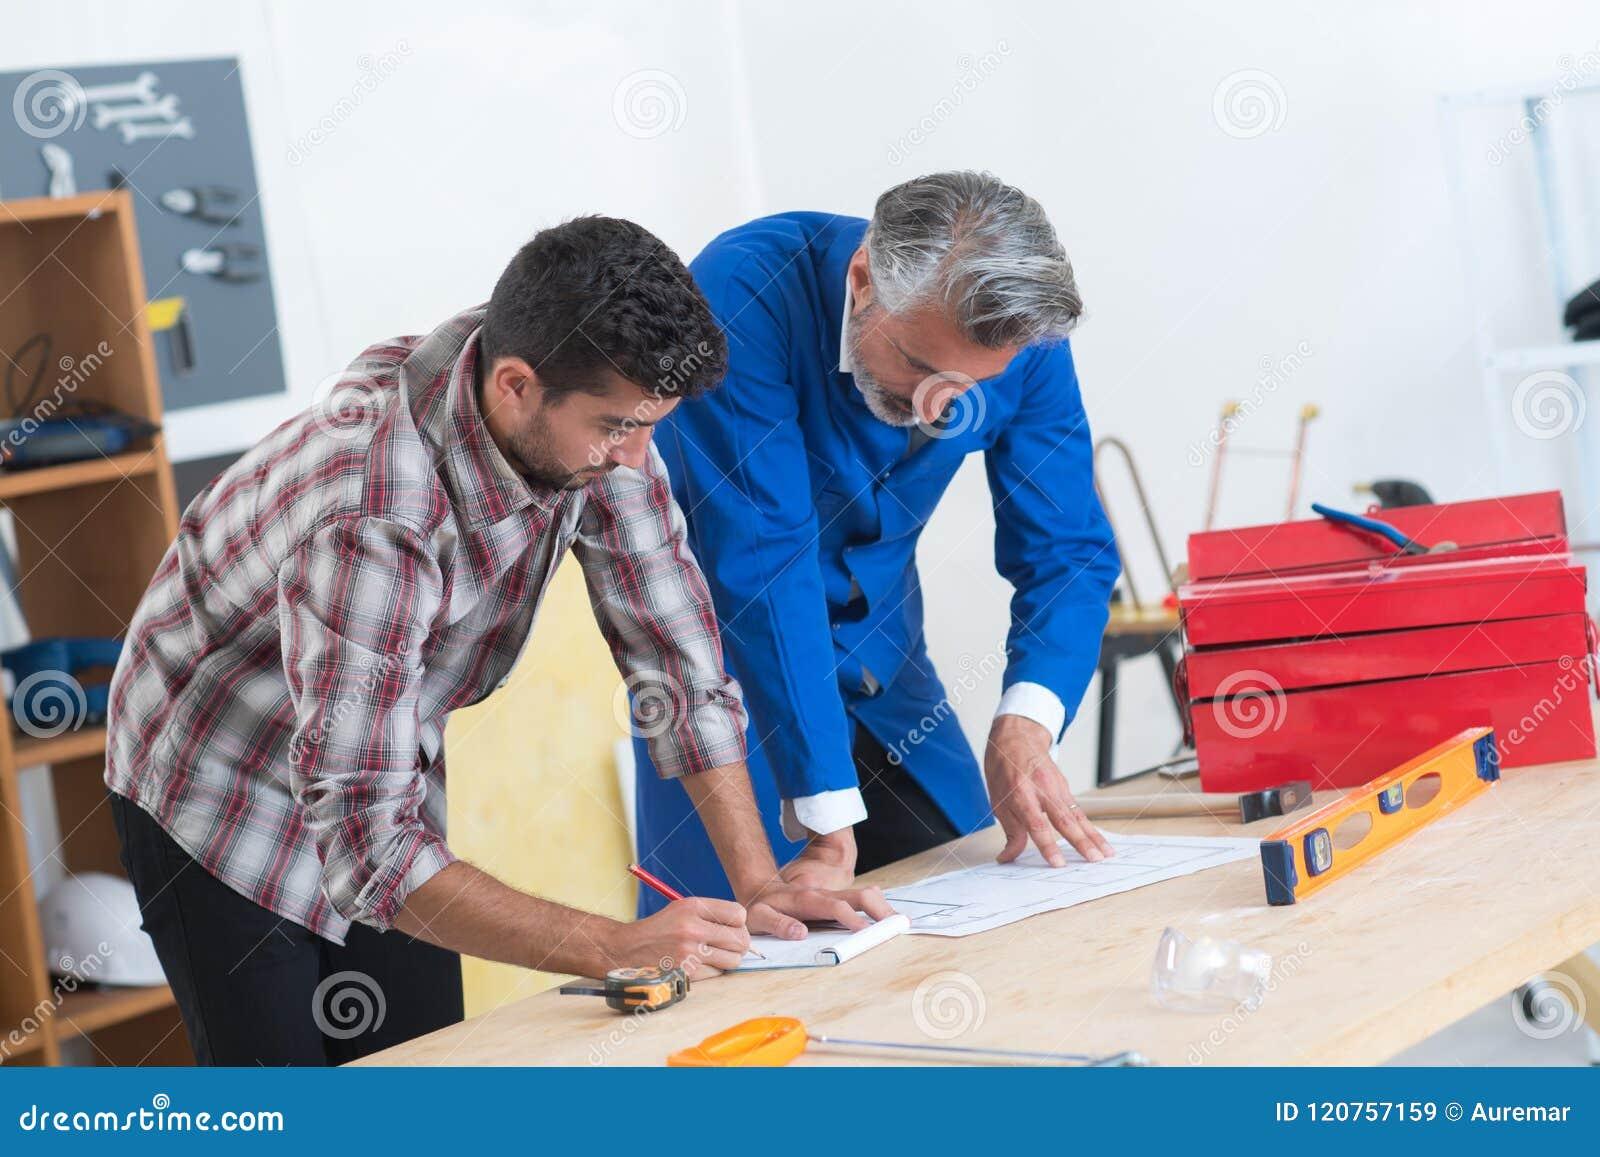 Mason and engineer measuring plans